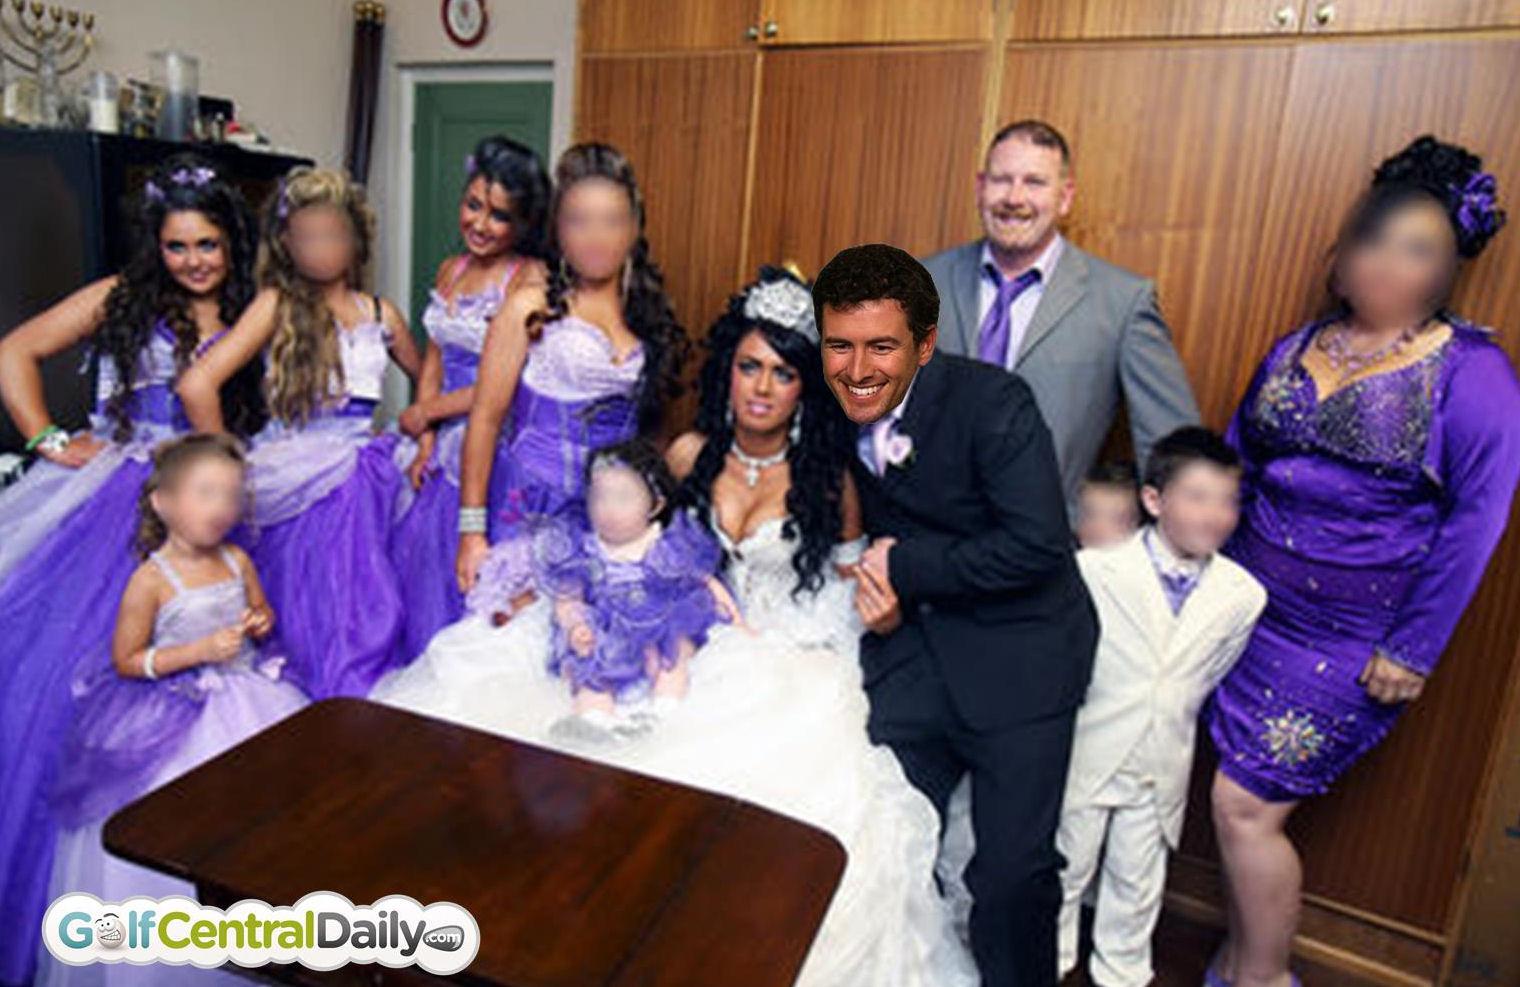 Adam Scott And Marie Kojzar To Have Big Fat Gypsy Wedding Baby